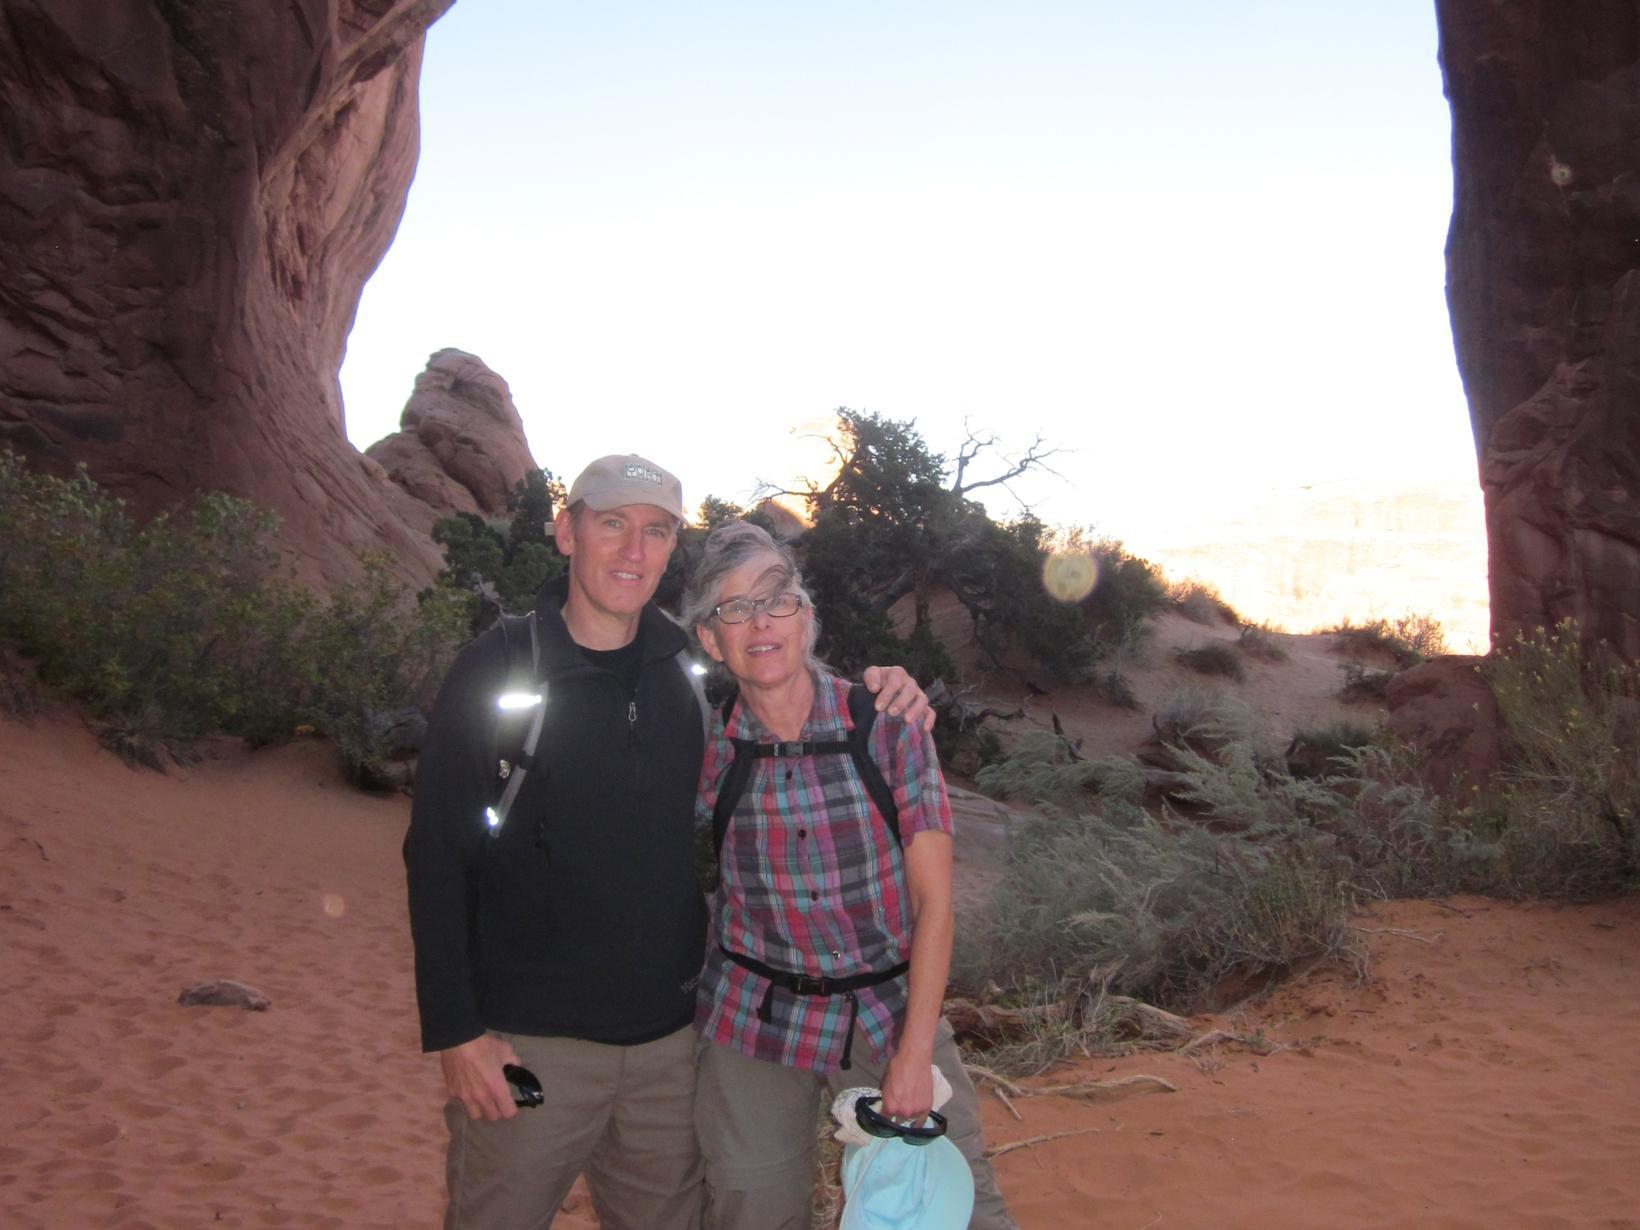 Sona & Jim from Colorado Springs, Colorado, United States